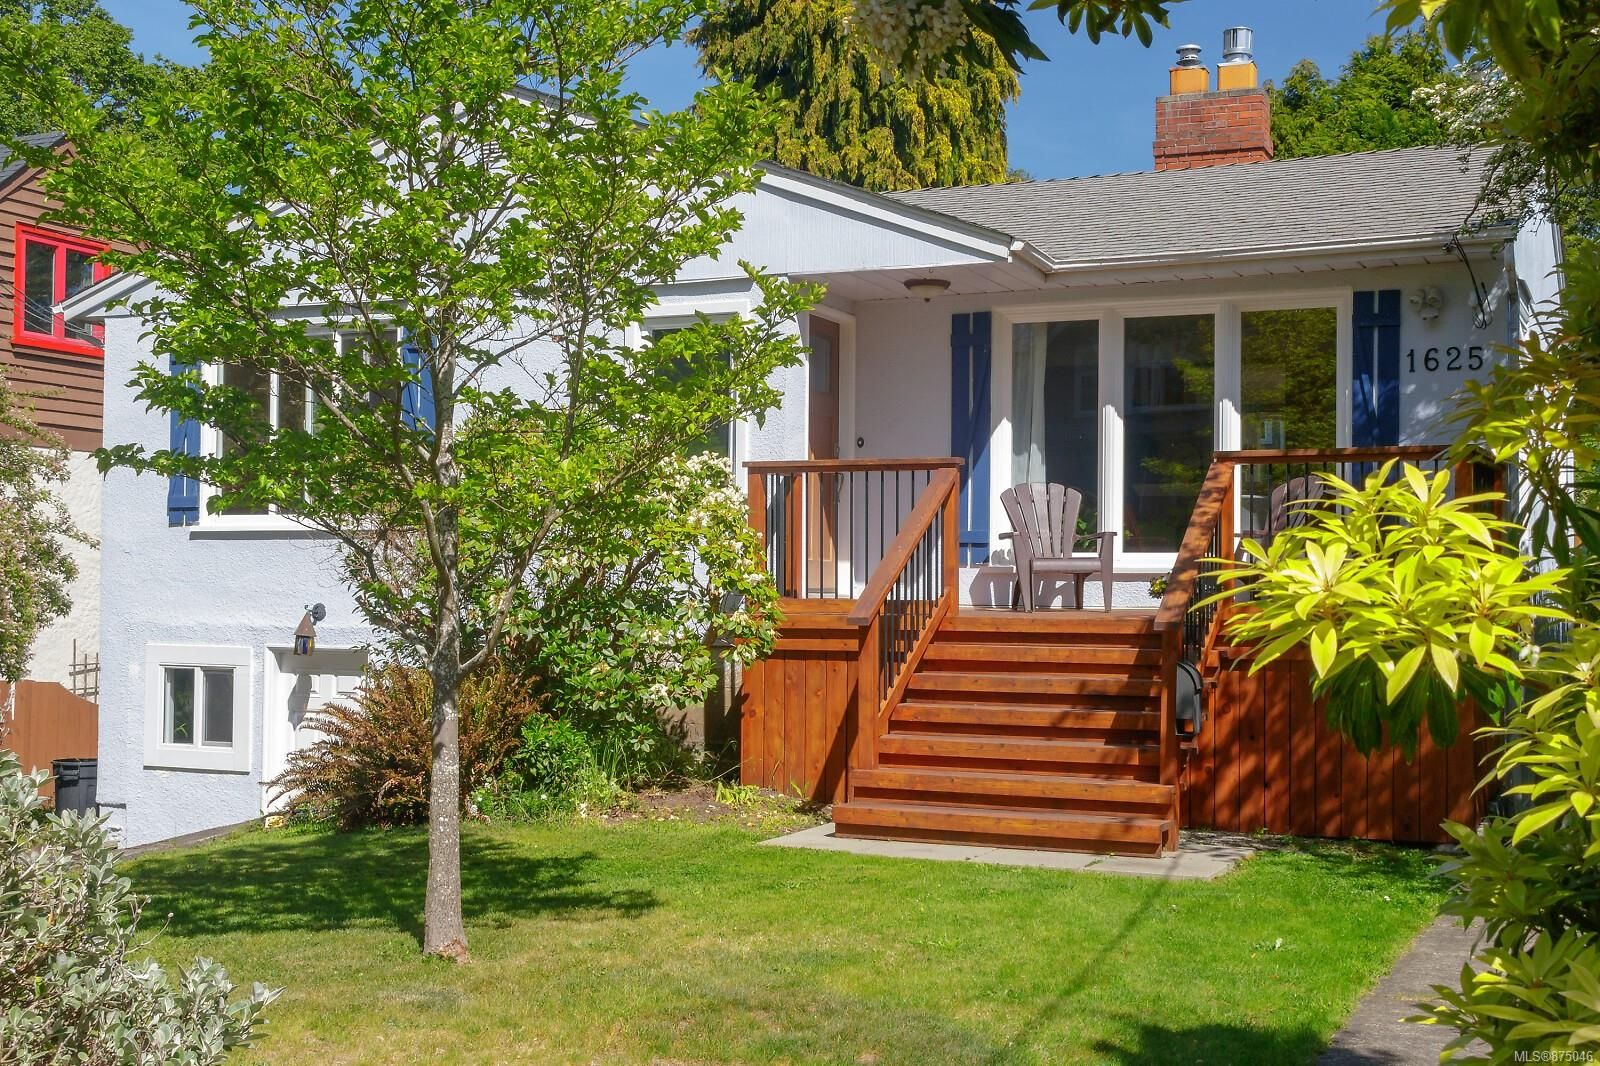 Main Photo: 1625 Yale St in : OB North Oak Bay House for sale (Oak Bay)  : MLS®# 875046